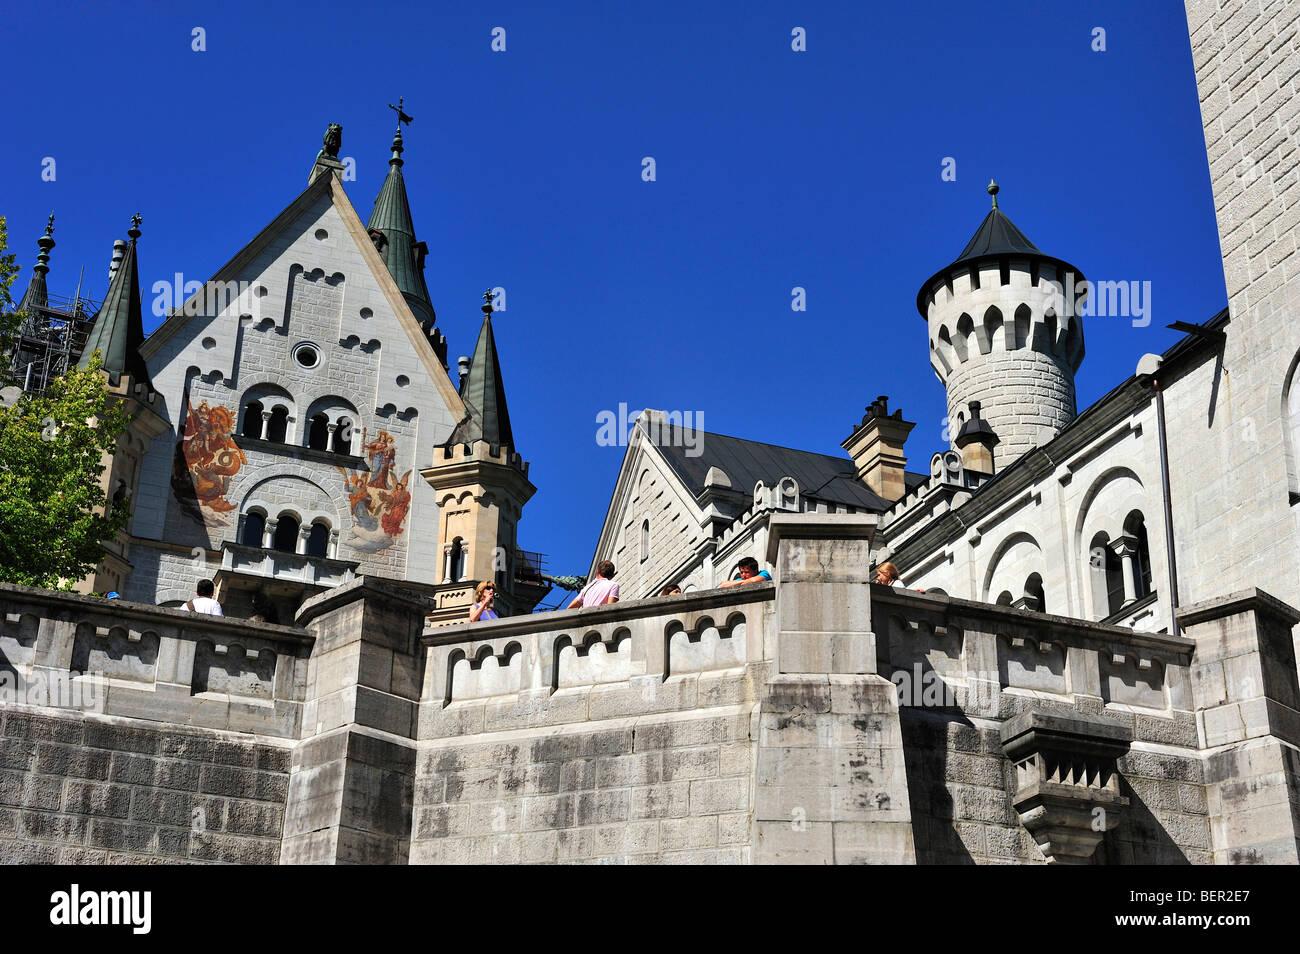 Neuschwanstein Castle, District of Ostallgäu, Bavaria, Germany - Stock Image